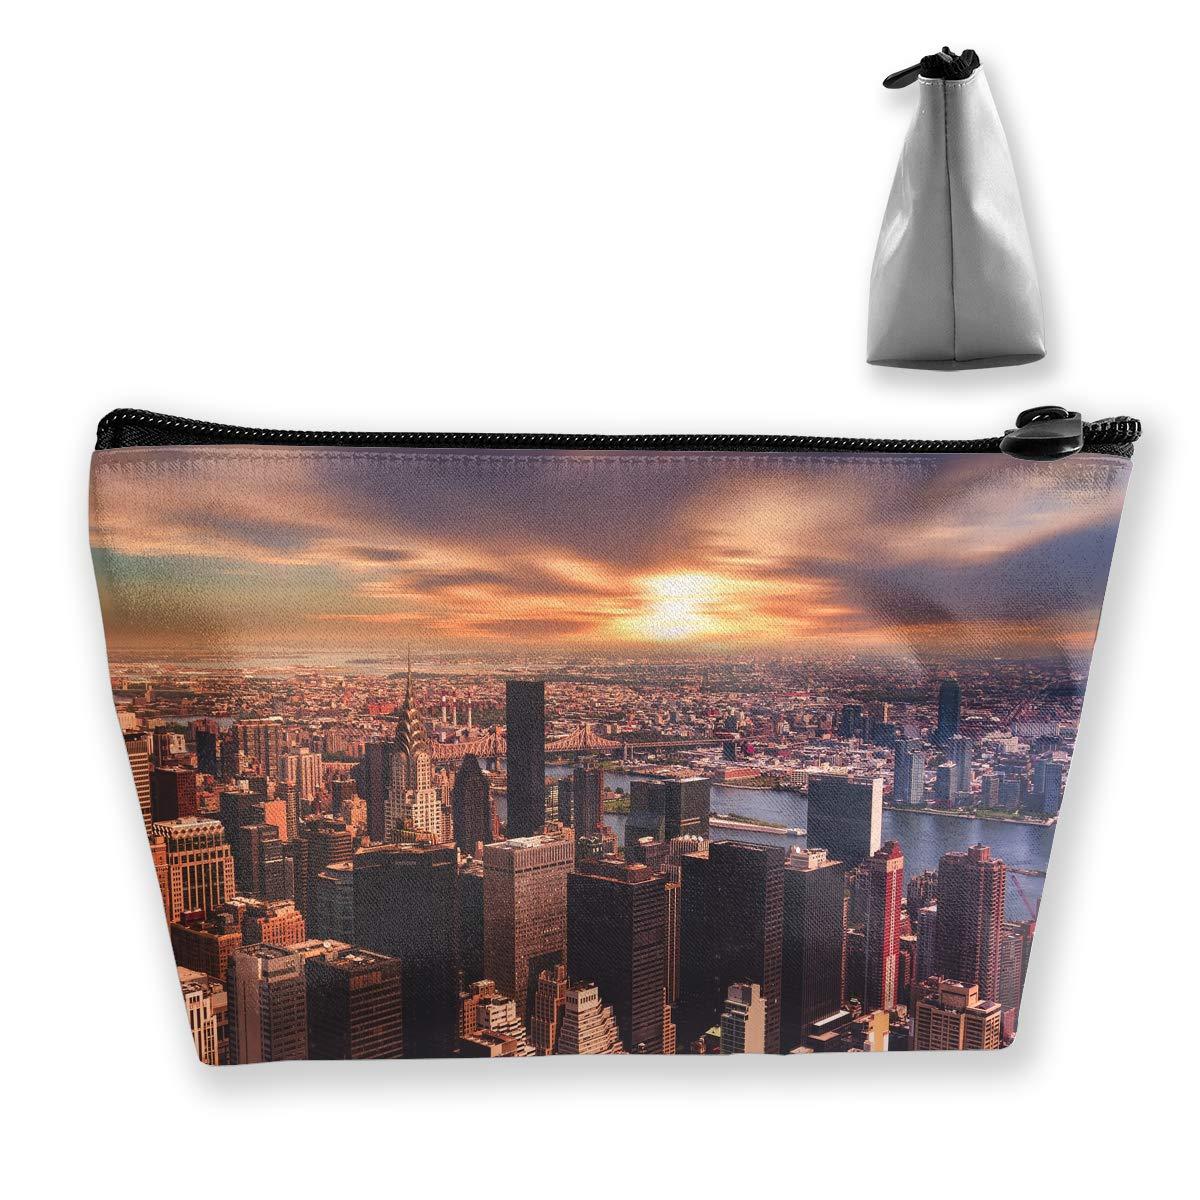 Travel Cosmetic Bags New York City Small Makeup Bag Multifunction Pouch Cosmetic Handbag Toiletries Organizer Bag for Women Girl